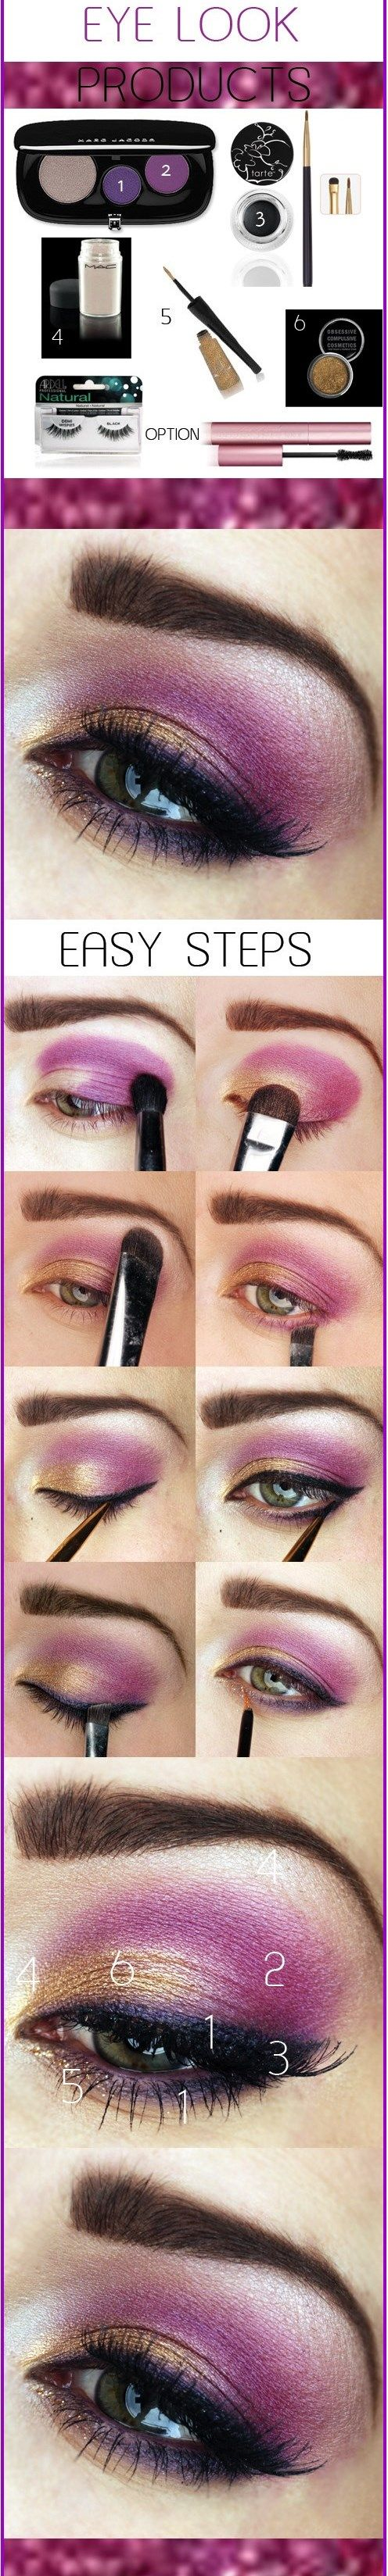 best eye makeup glasses images on pinterest make up beauty